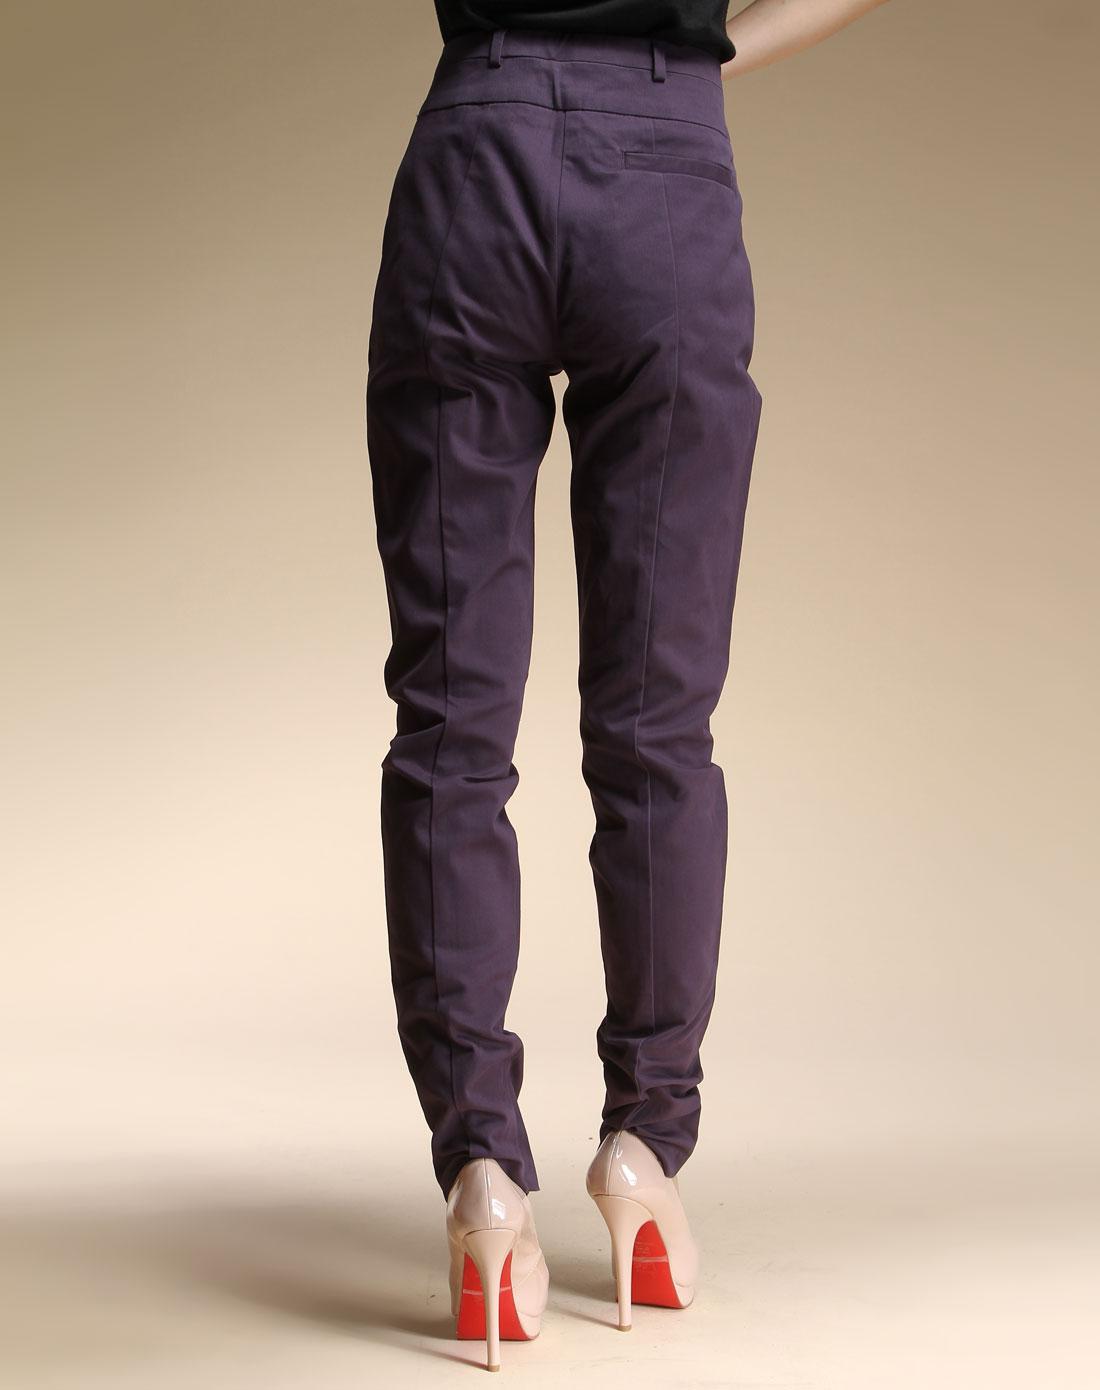 armani牛仔裤专场aj女款秀丽优雅修身长裤深紫色n51r5